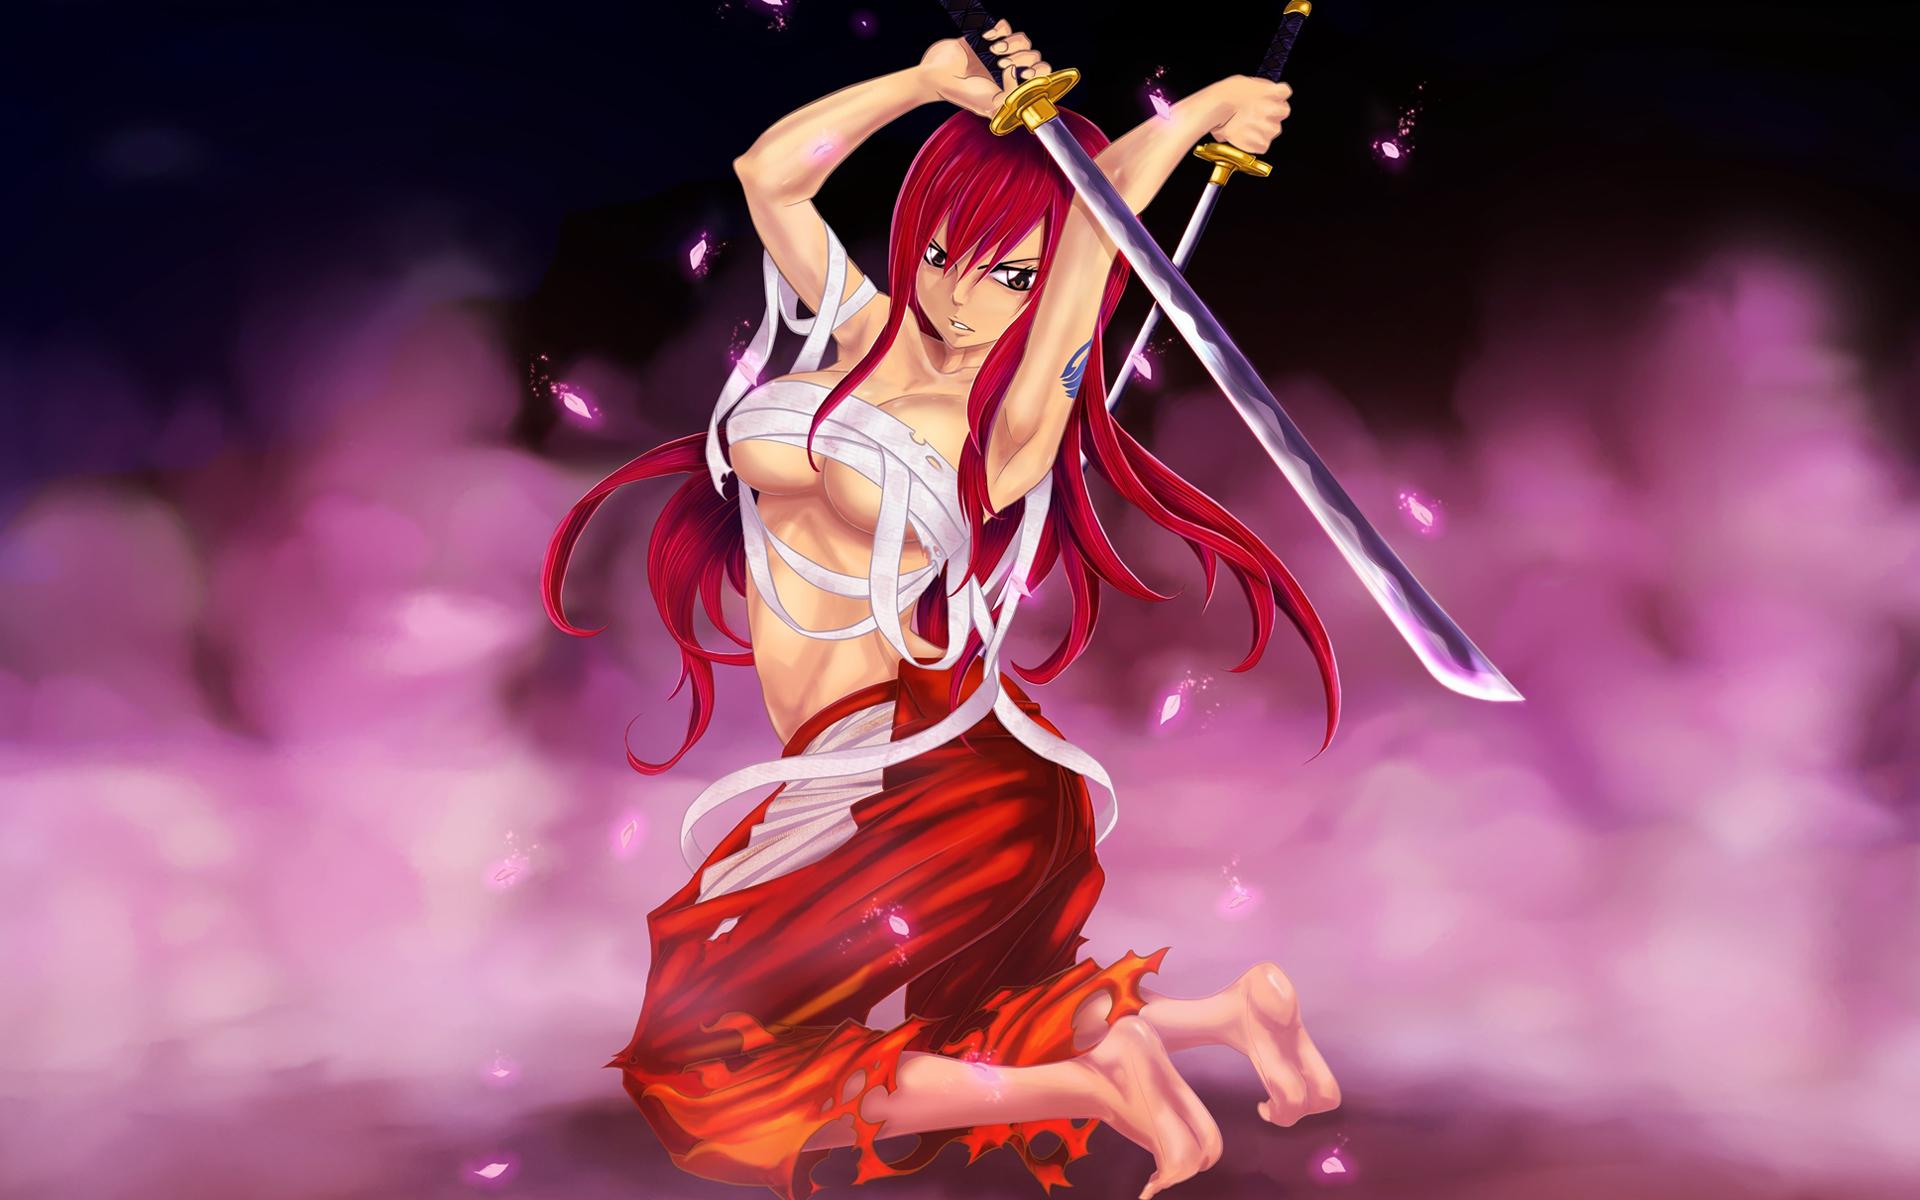 sexy erza scarlet katana girl anime fairy tail hd wallpaper 1920x1200 1920x1200